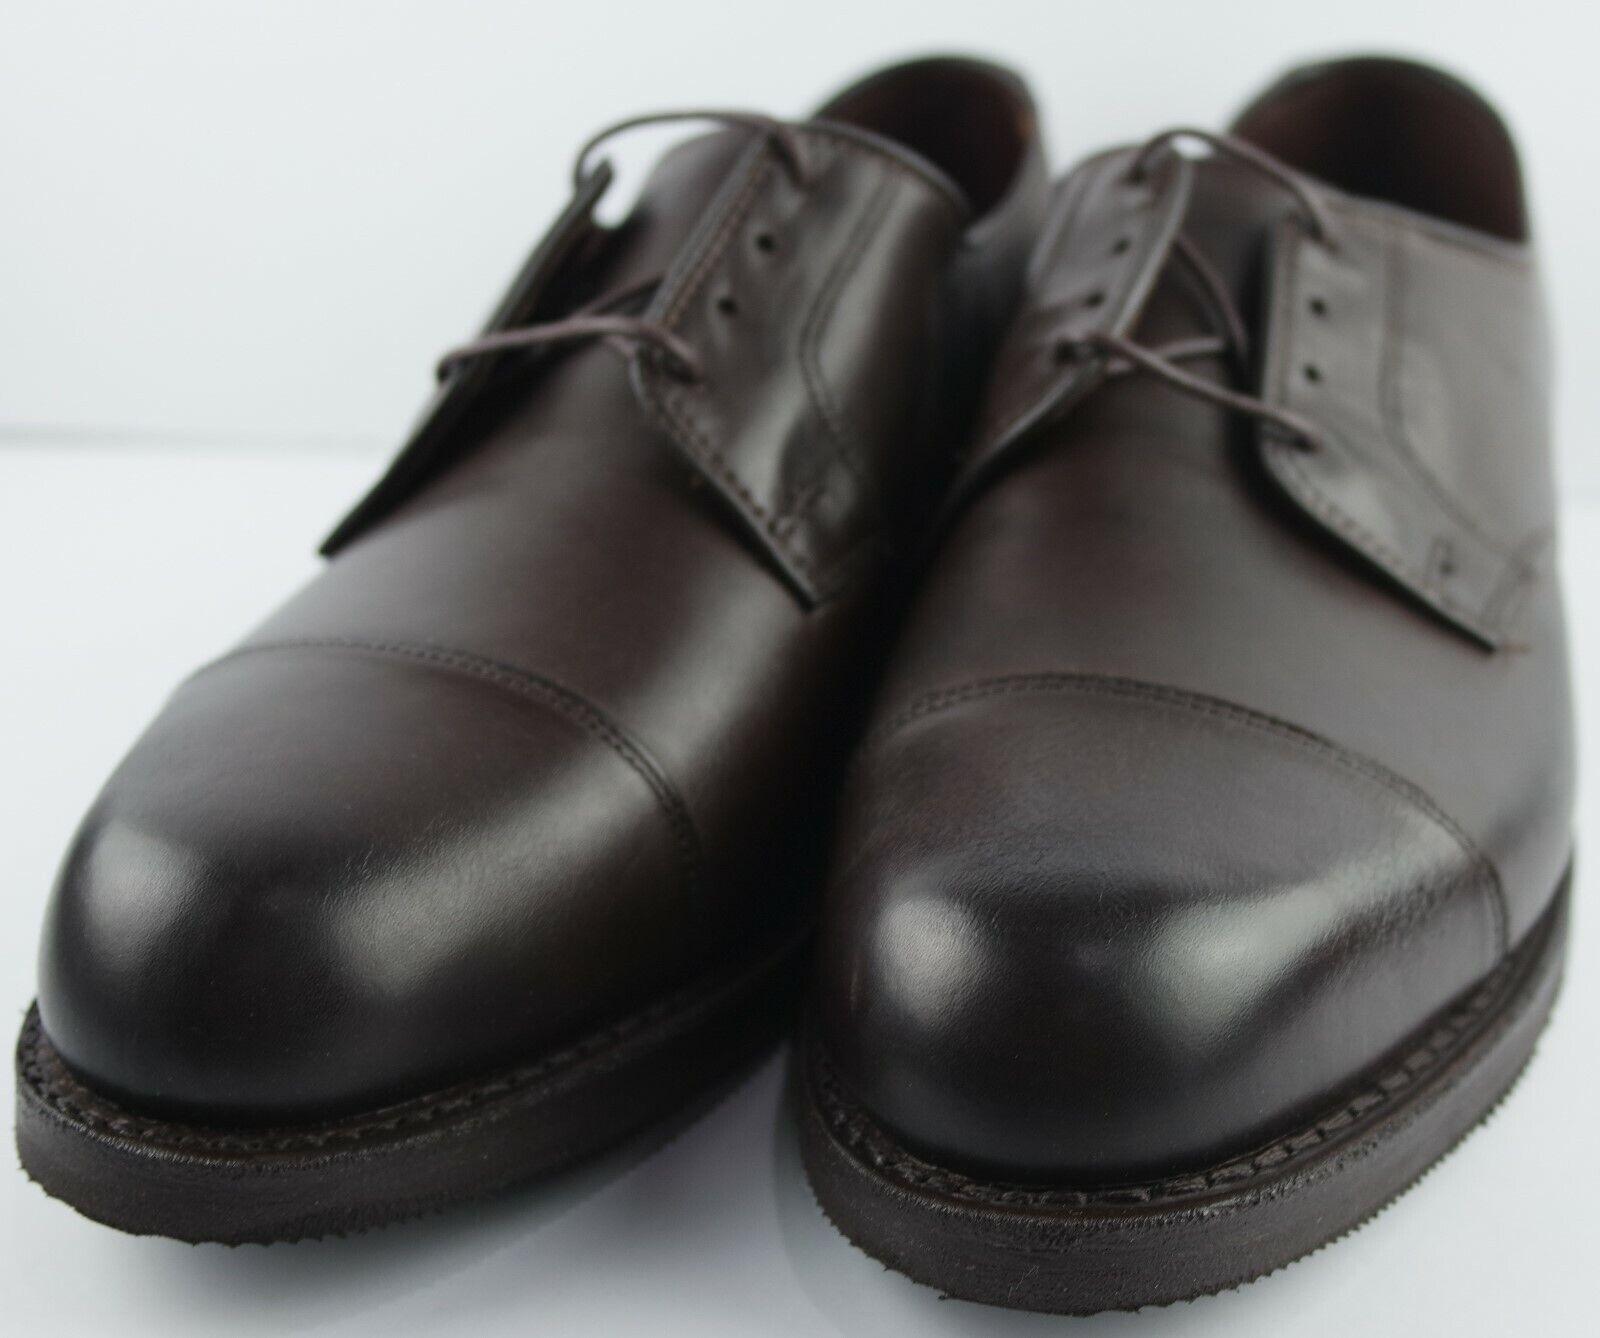 Allen Edmonds Men's ROAD WARIORS Dark  Marronee Cap Toe Oxfords Dimensione 9 D  a buon mercato